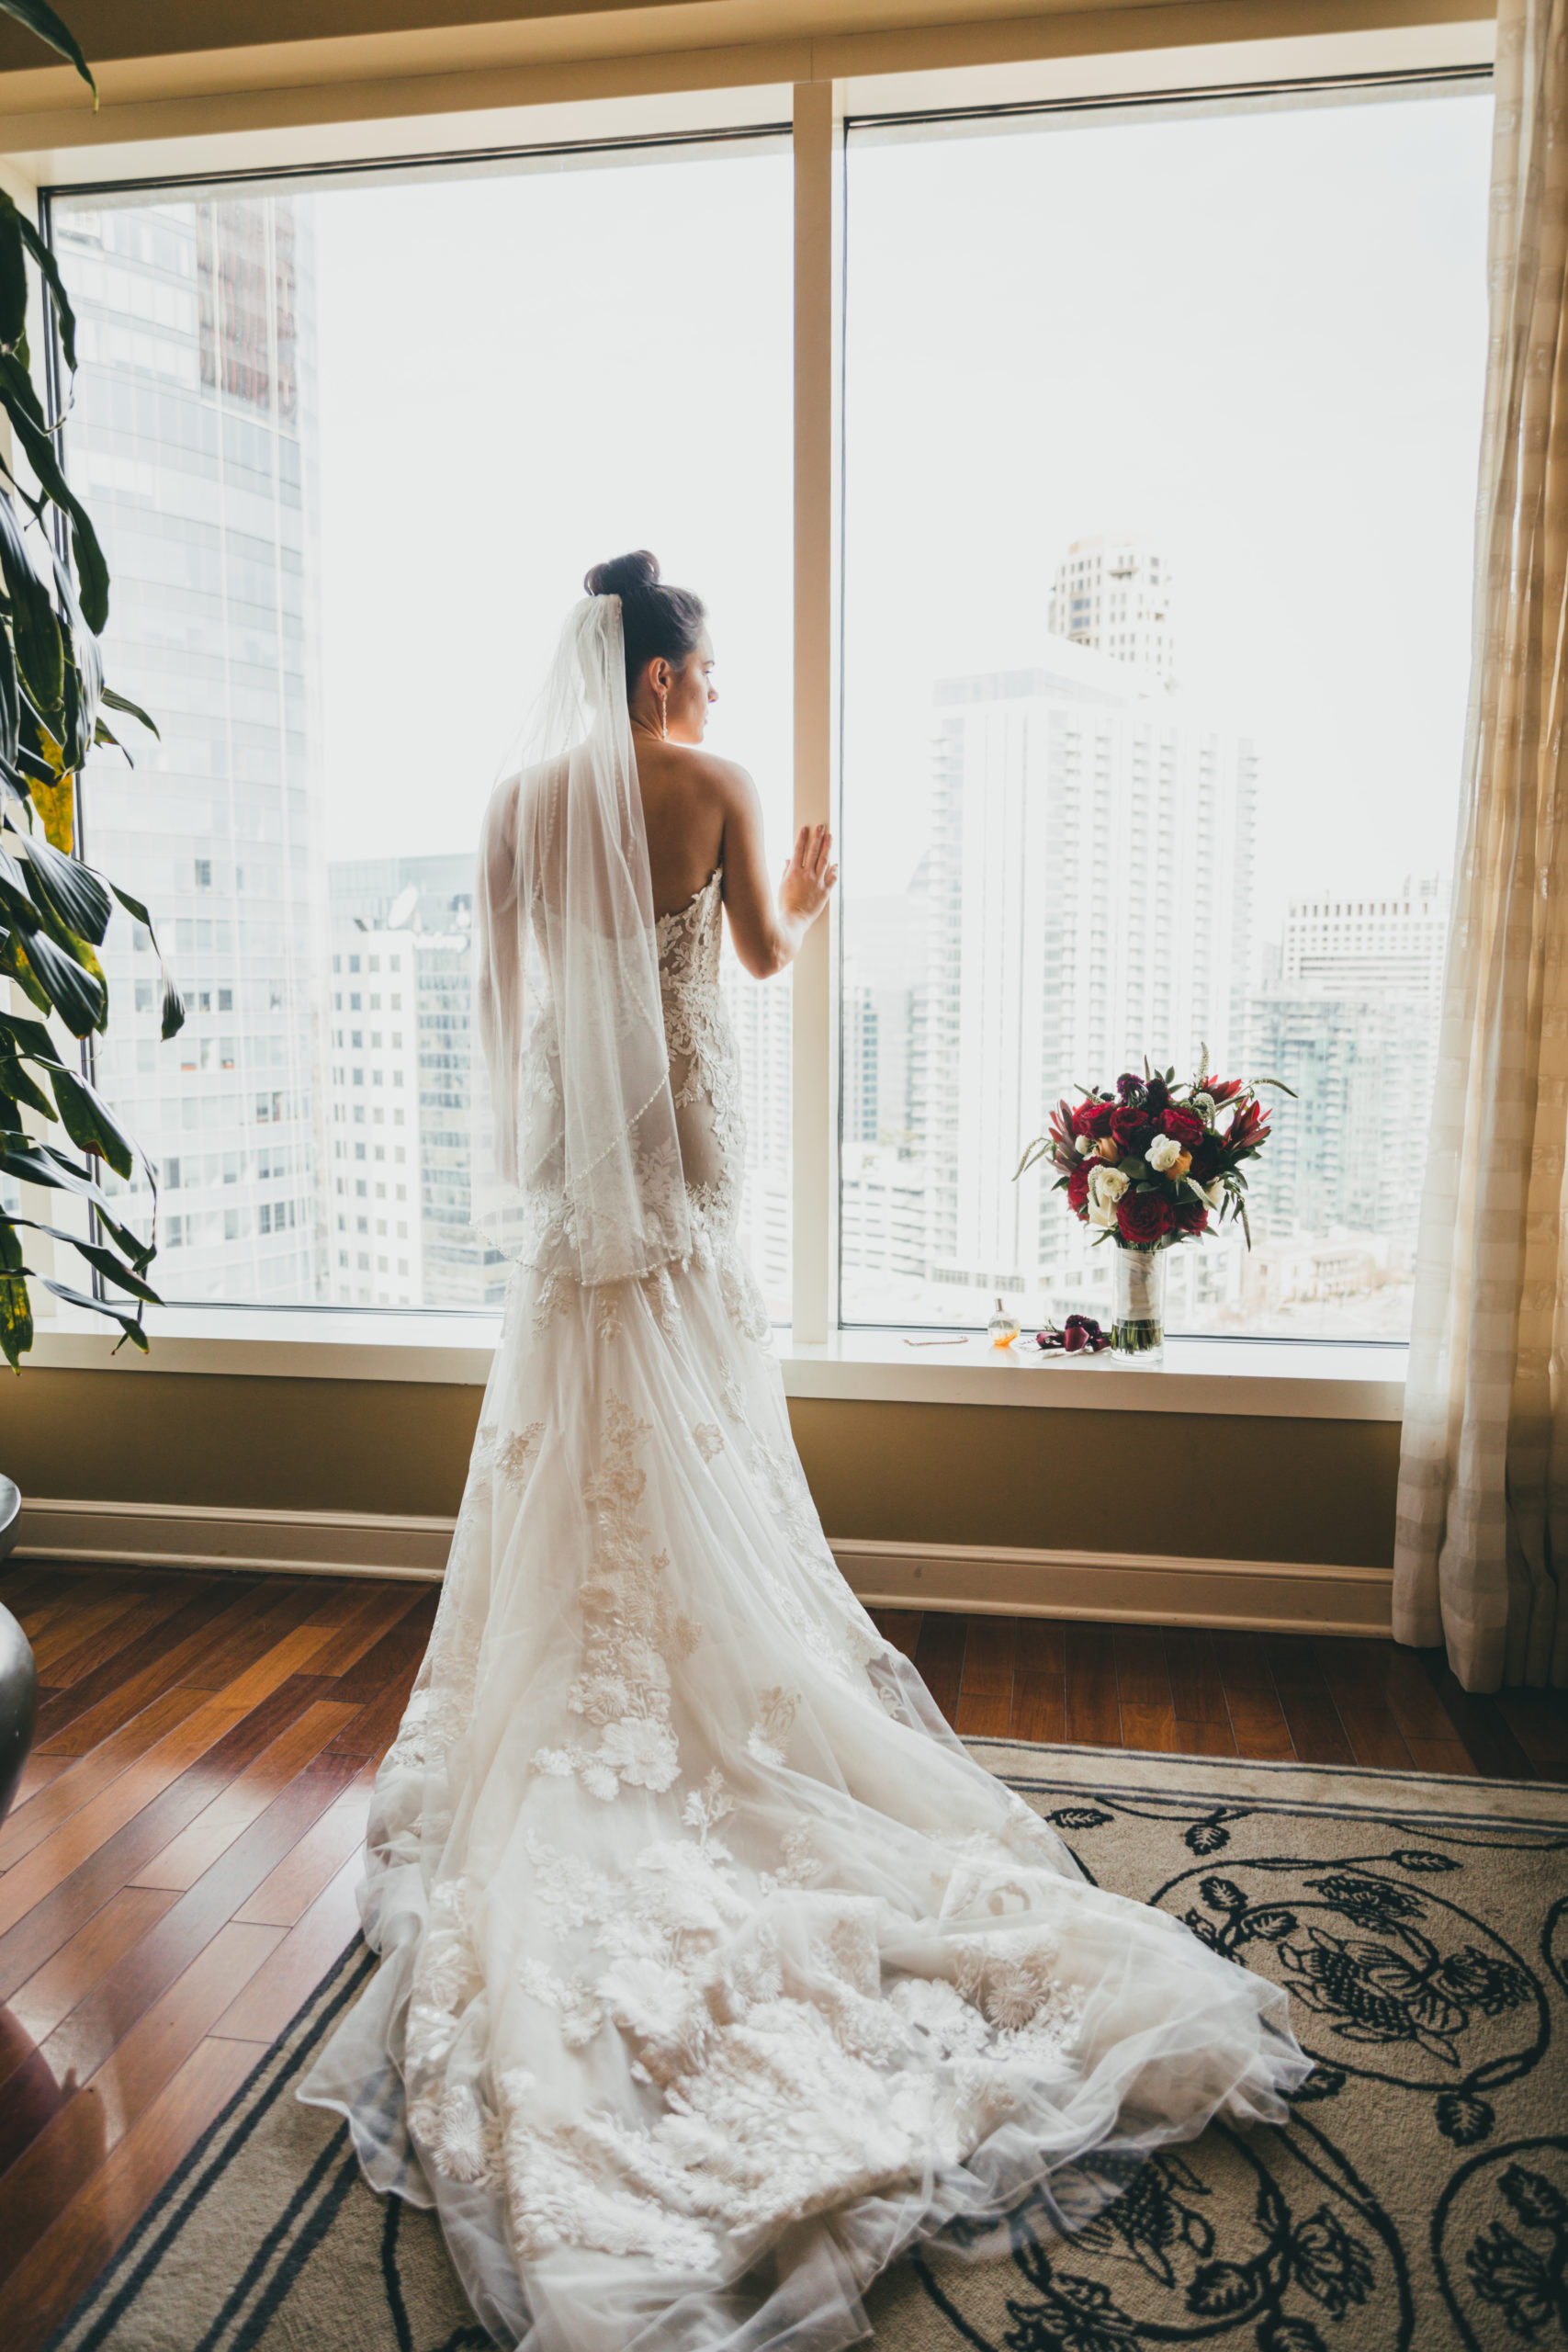 Westside-Warehouse-Wedding-MaryClaire-Corey-lsc9342